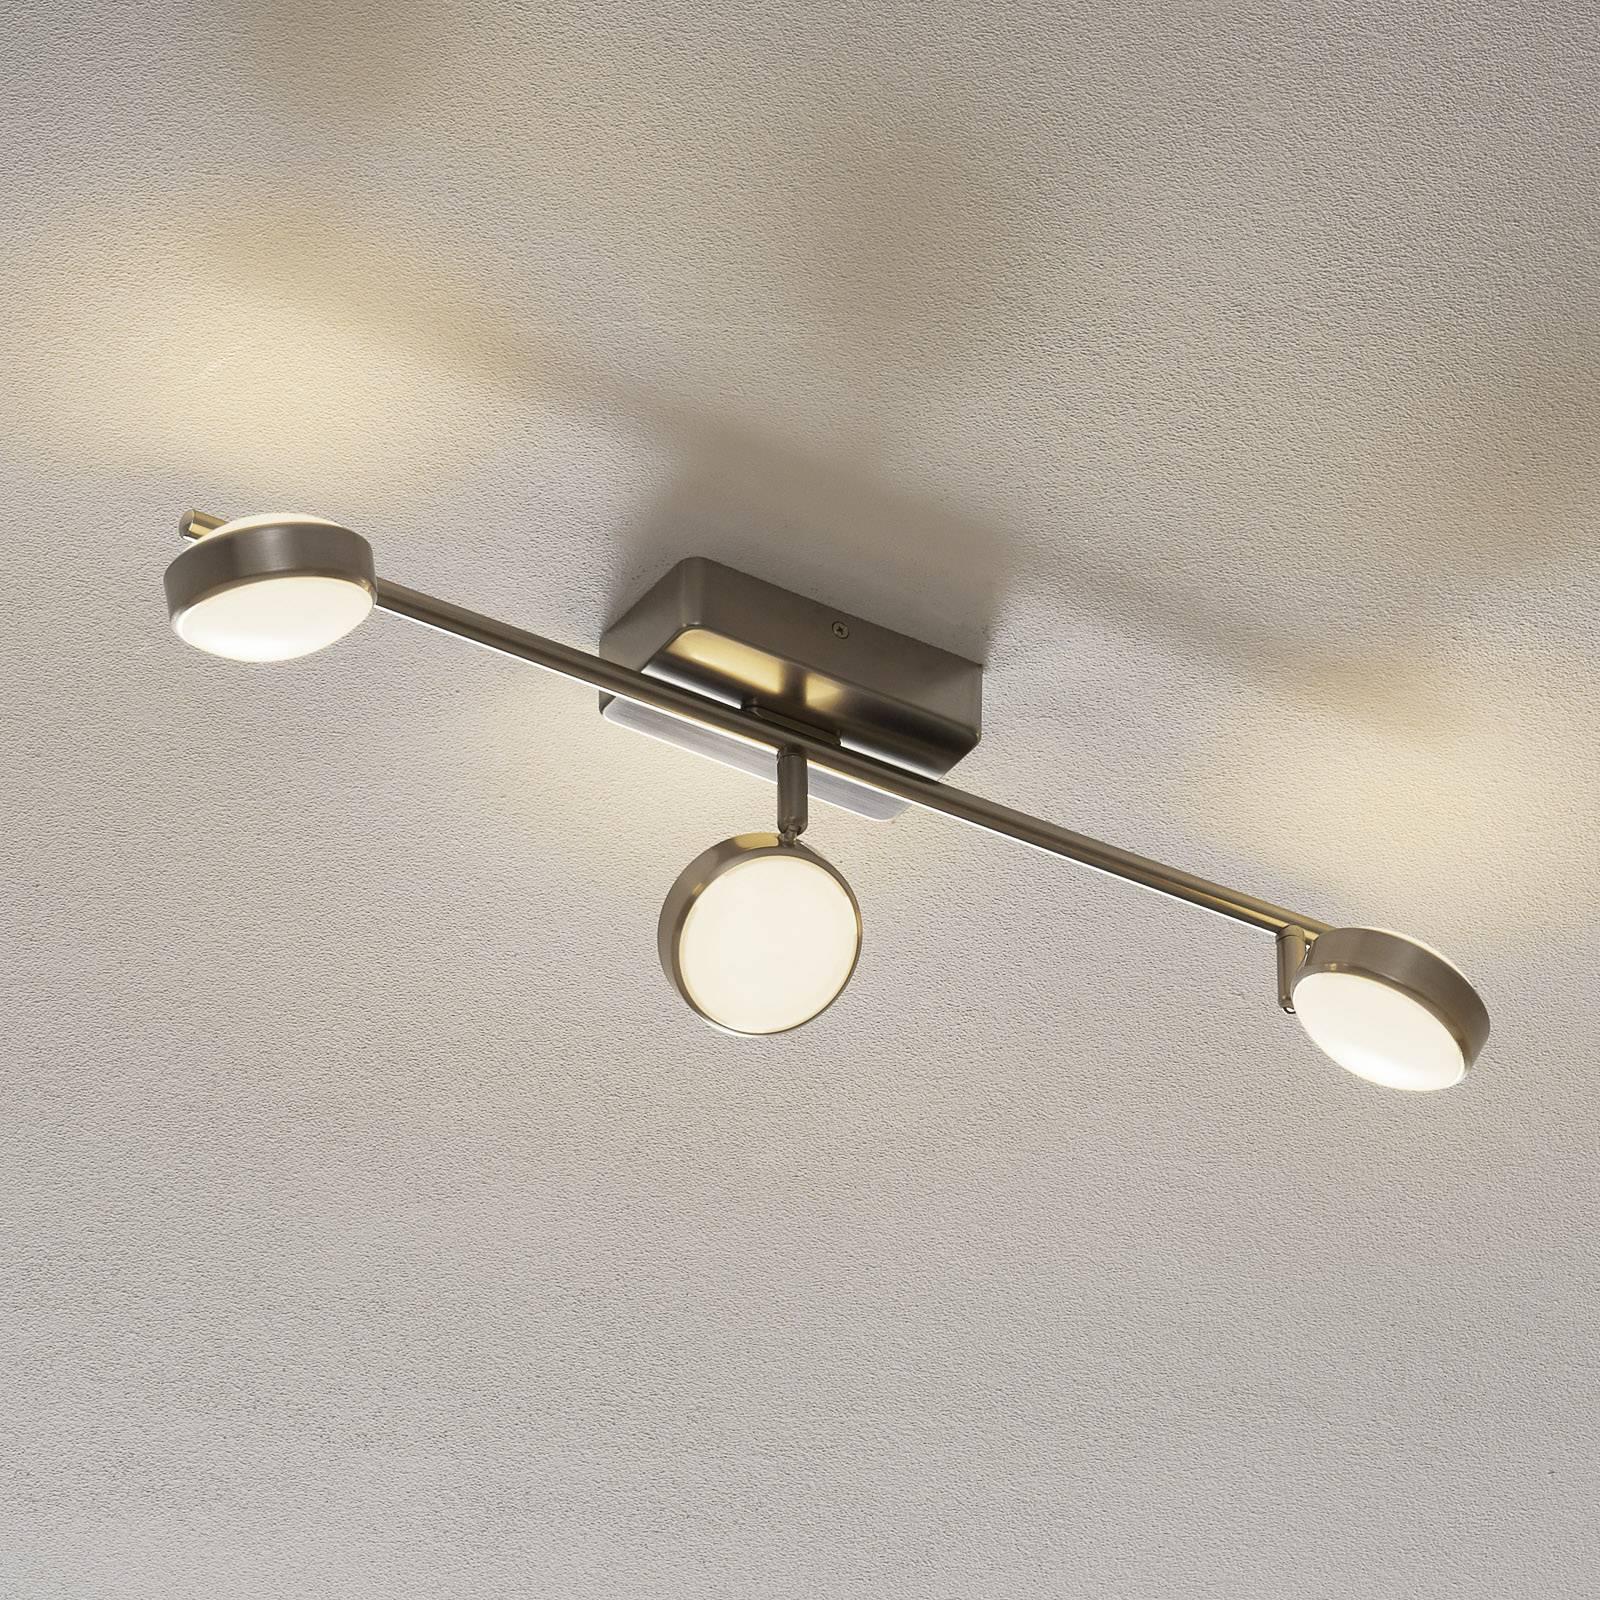 EGLO connect Corropoli-C-LED-kattospotti 3-lamp.